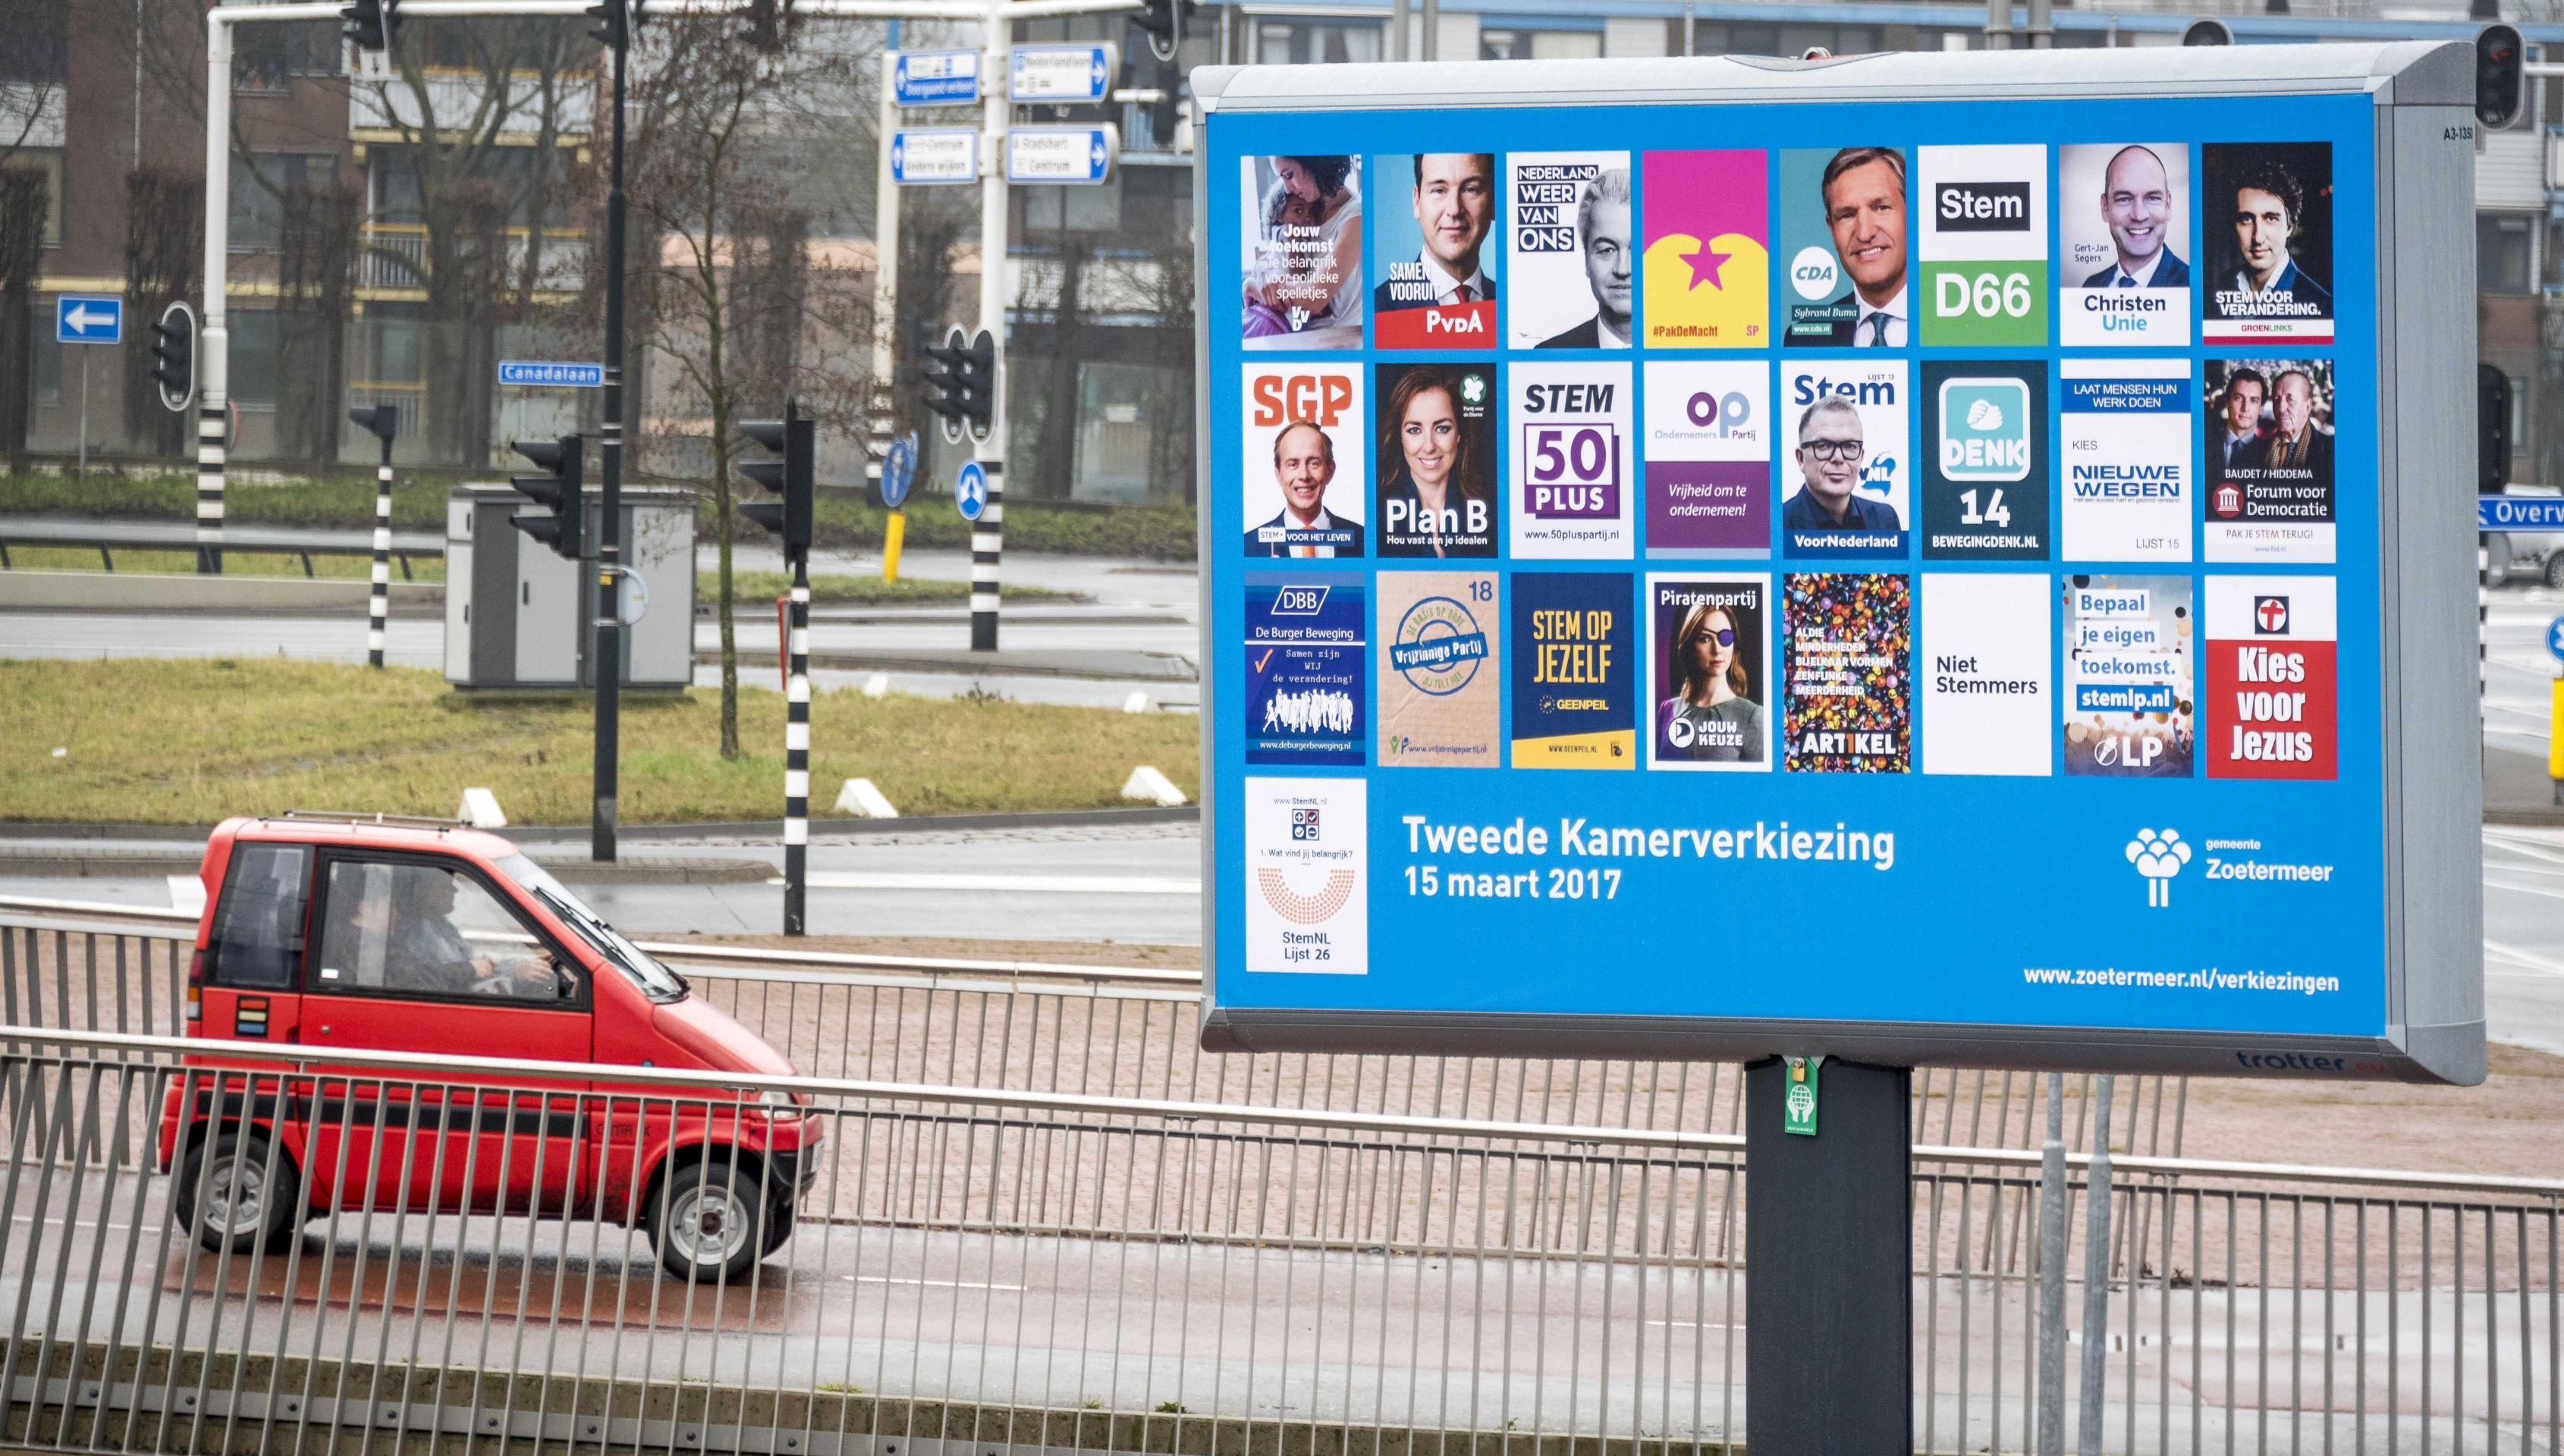 IZBORI U NIZOZEMSKOJ Rutte ima malu prednost pred Wildersom